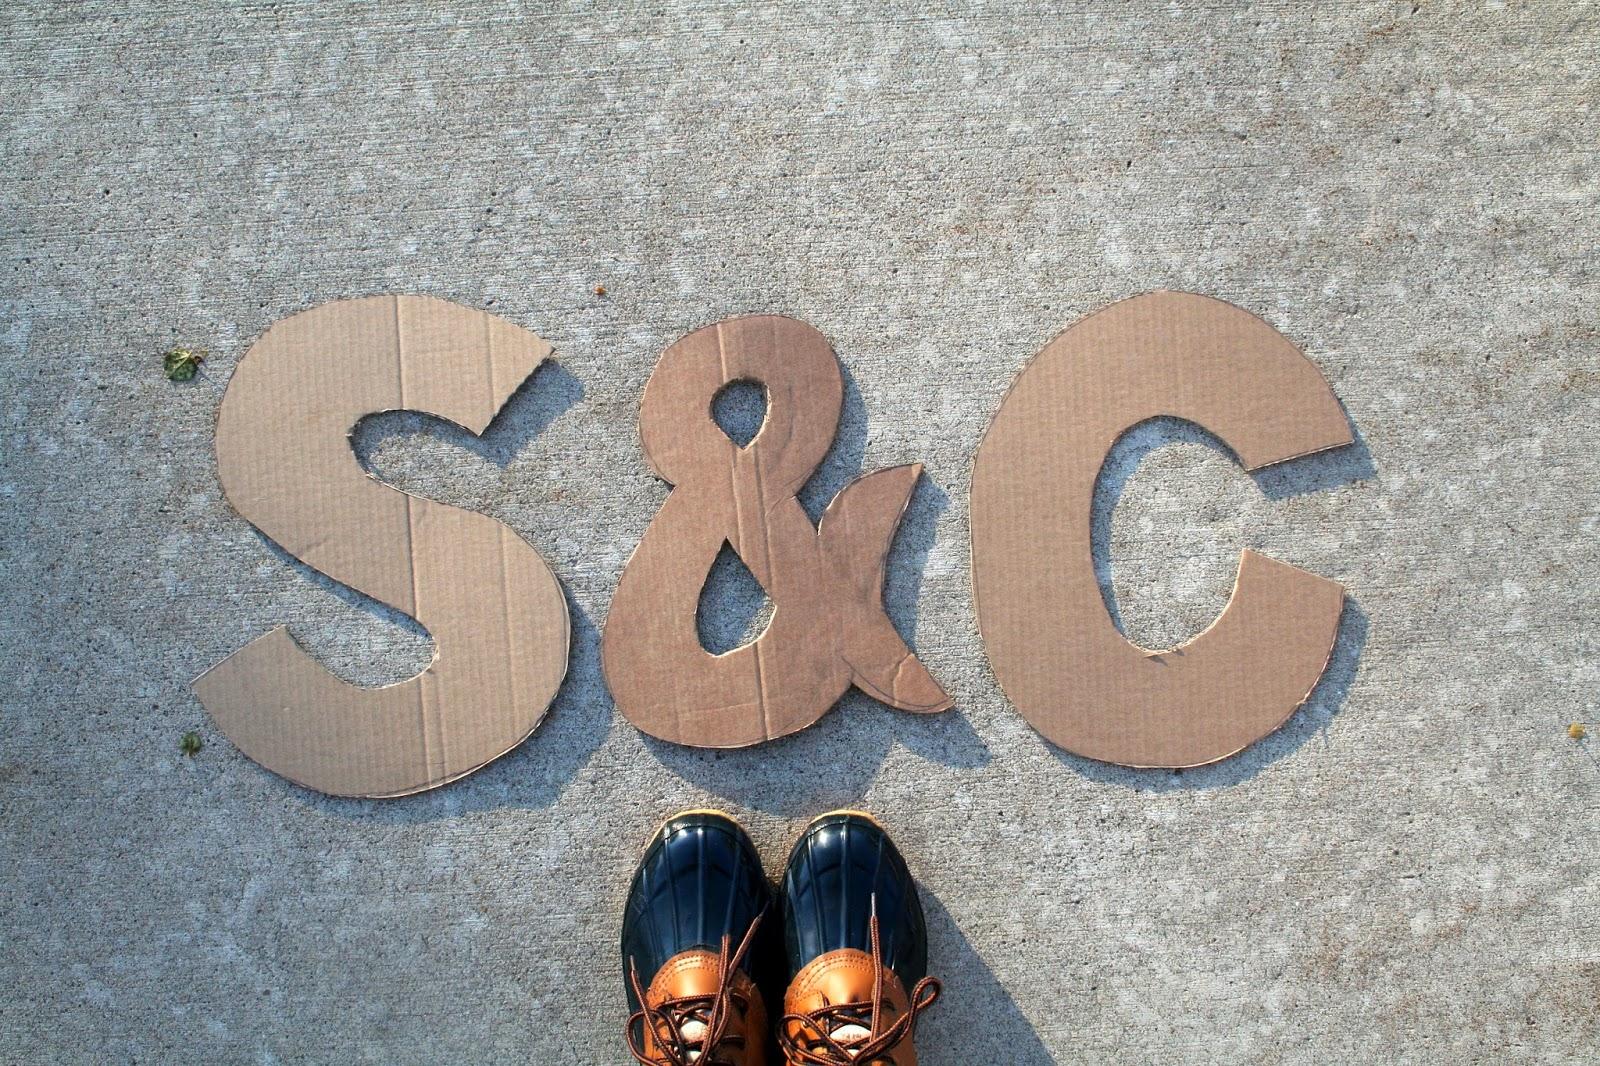 Lyrical bits diy coffee filter monogram letters for 3 foot cardboard letters